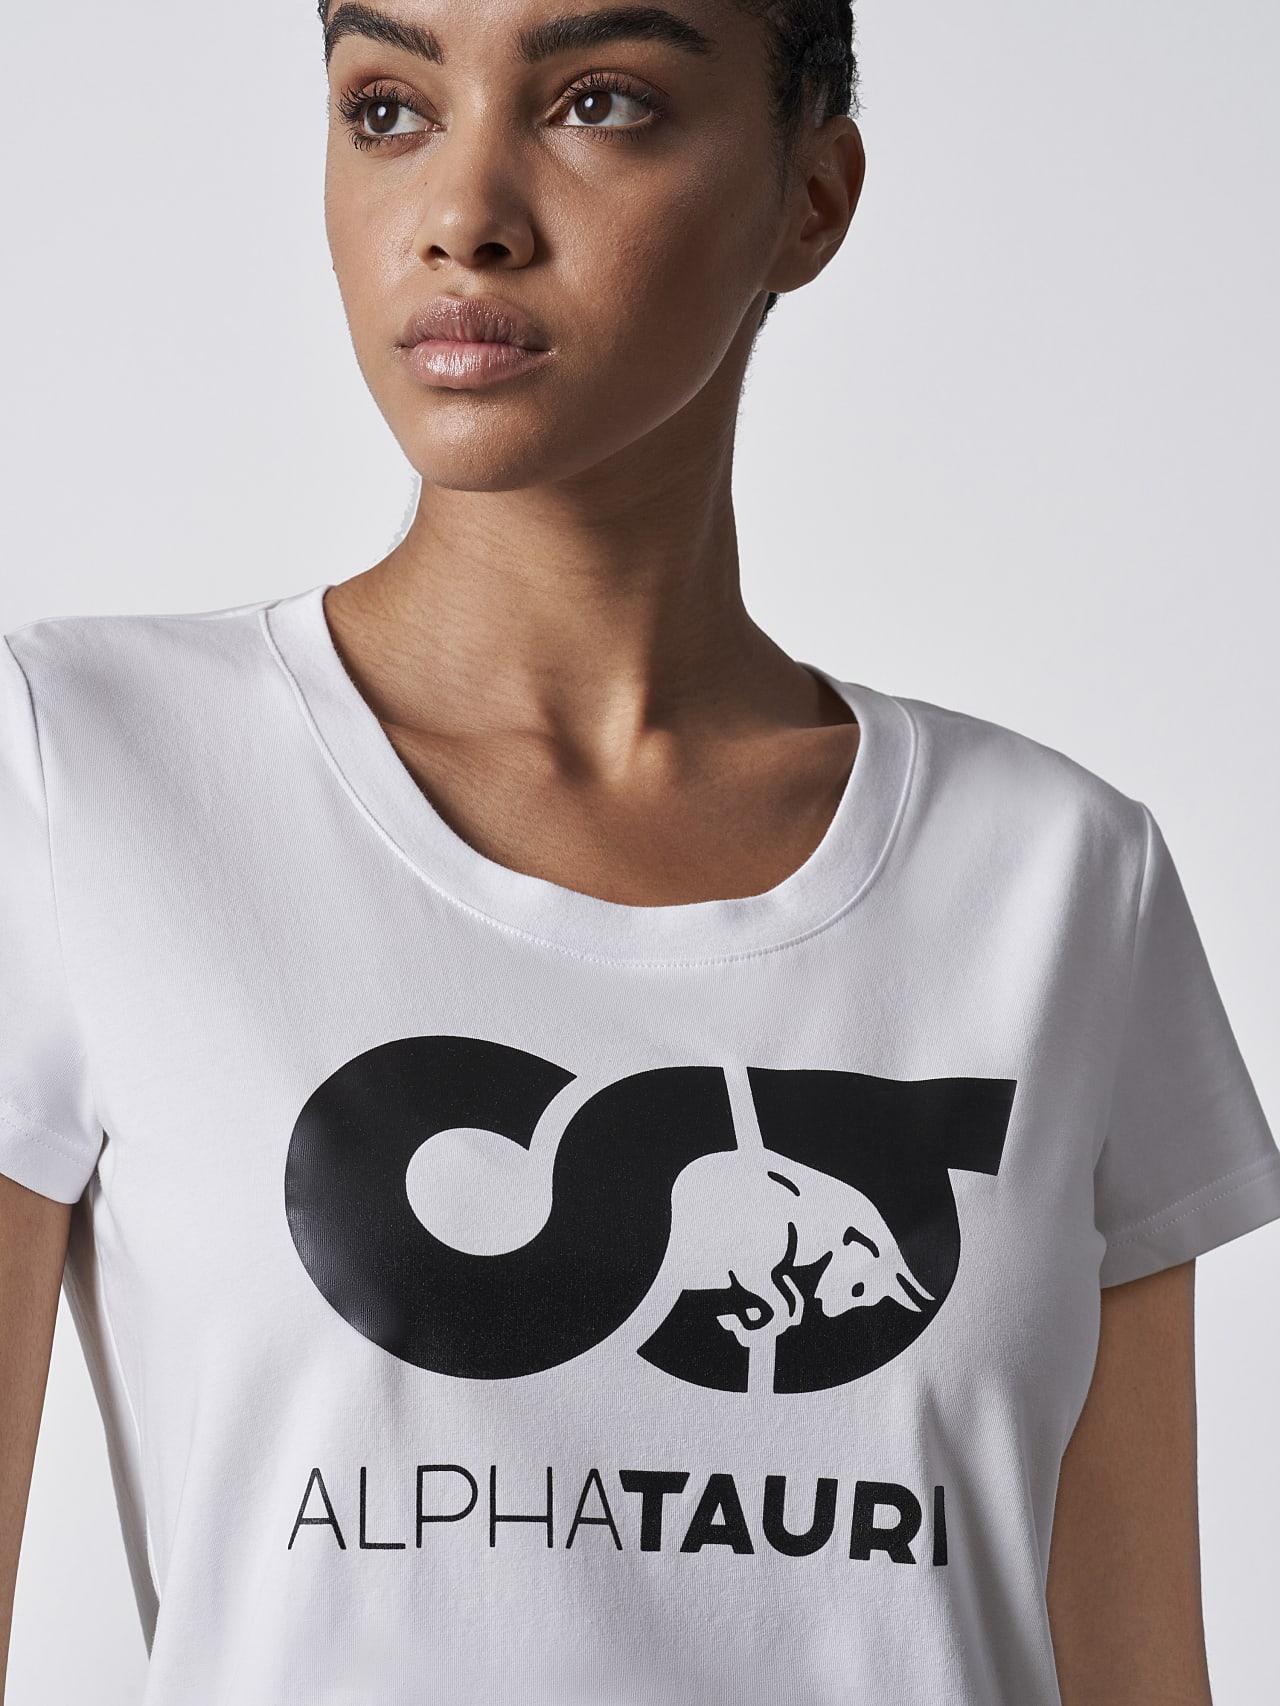 JERU V2.Y4.02 Signature Logo T-Shirt white Right Alpha Tauri